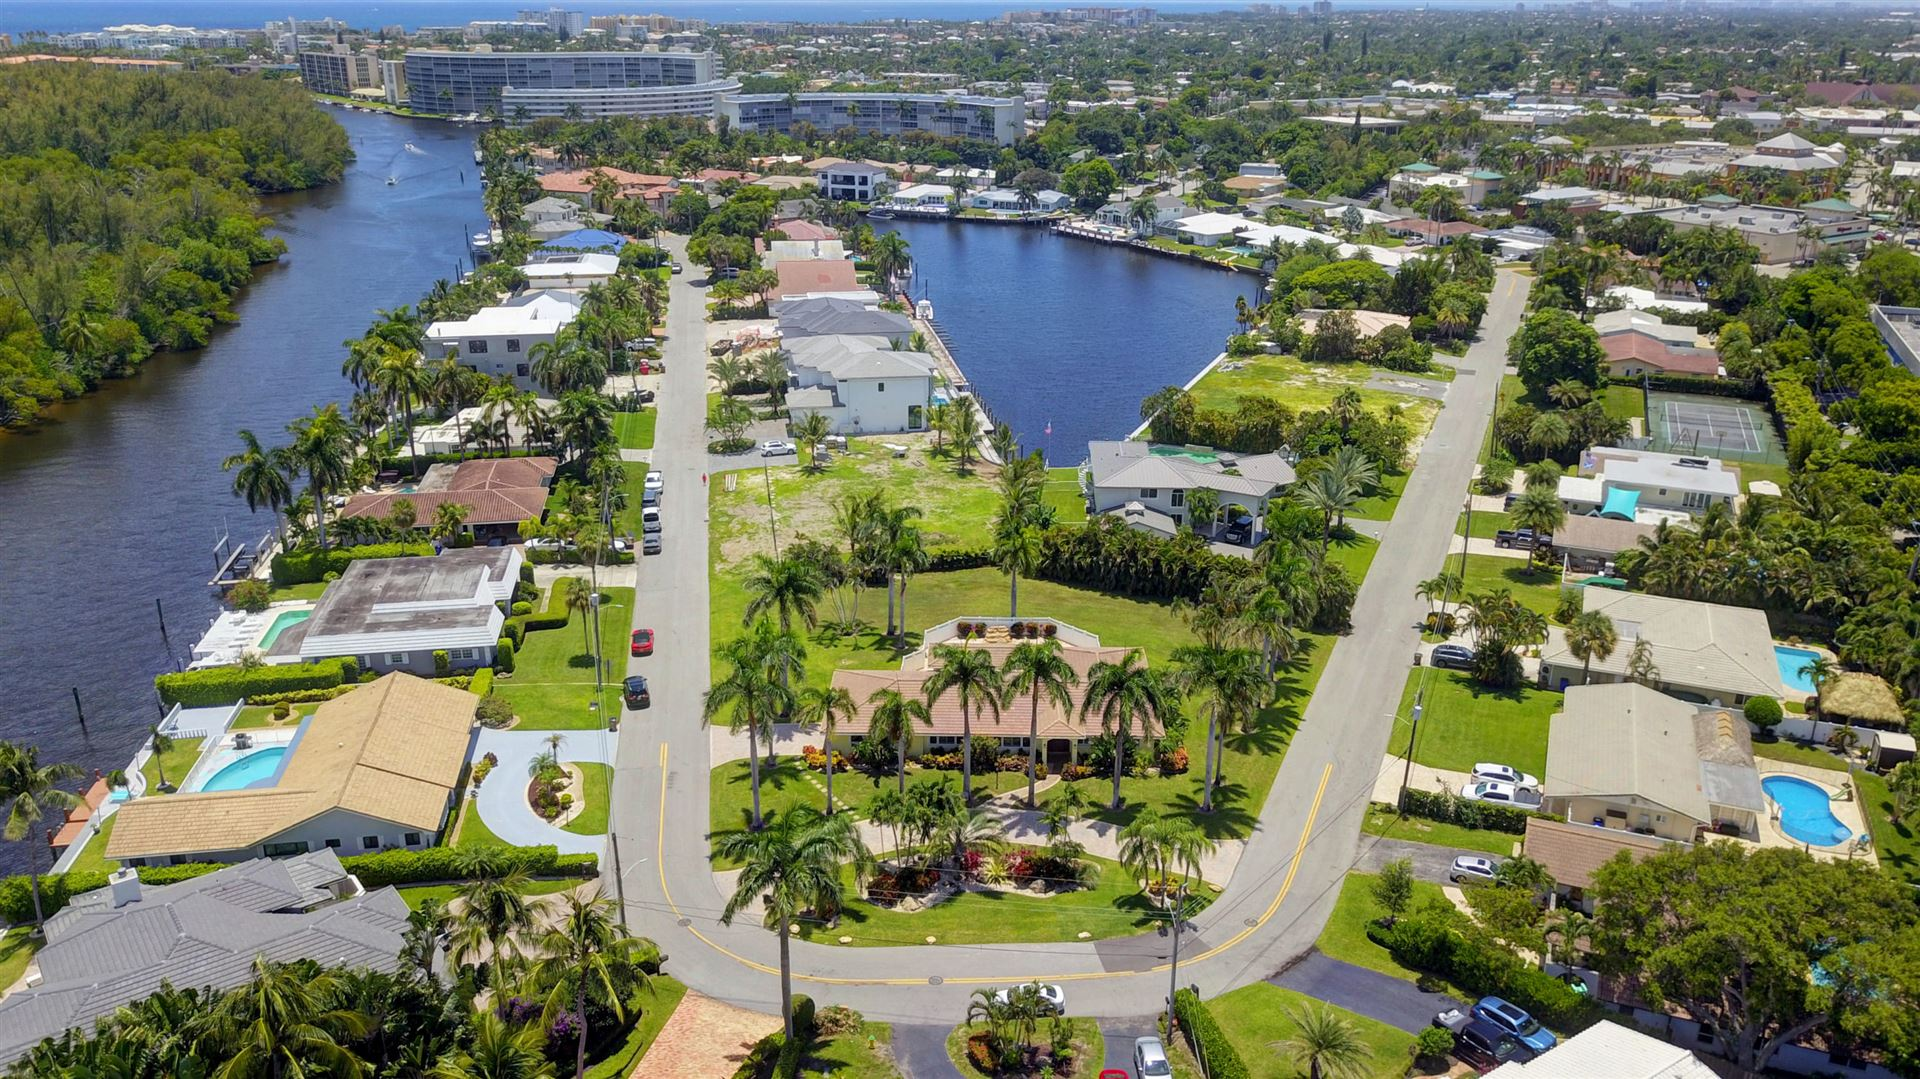 Photo of 46 Little Harbor Way, Deerfield Beach, FL 33441 (MLS # RX-10732256)